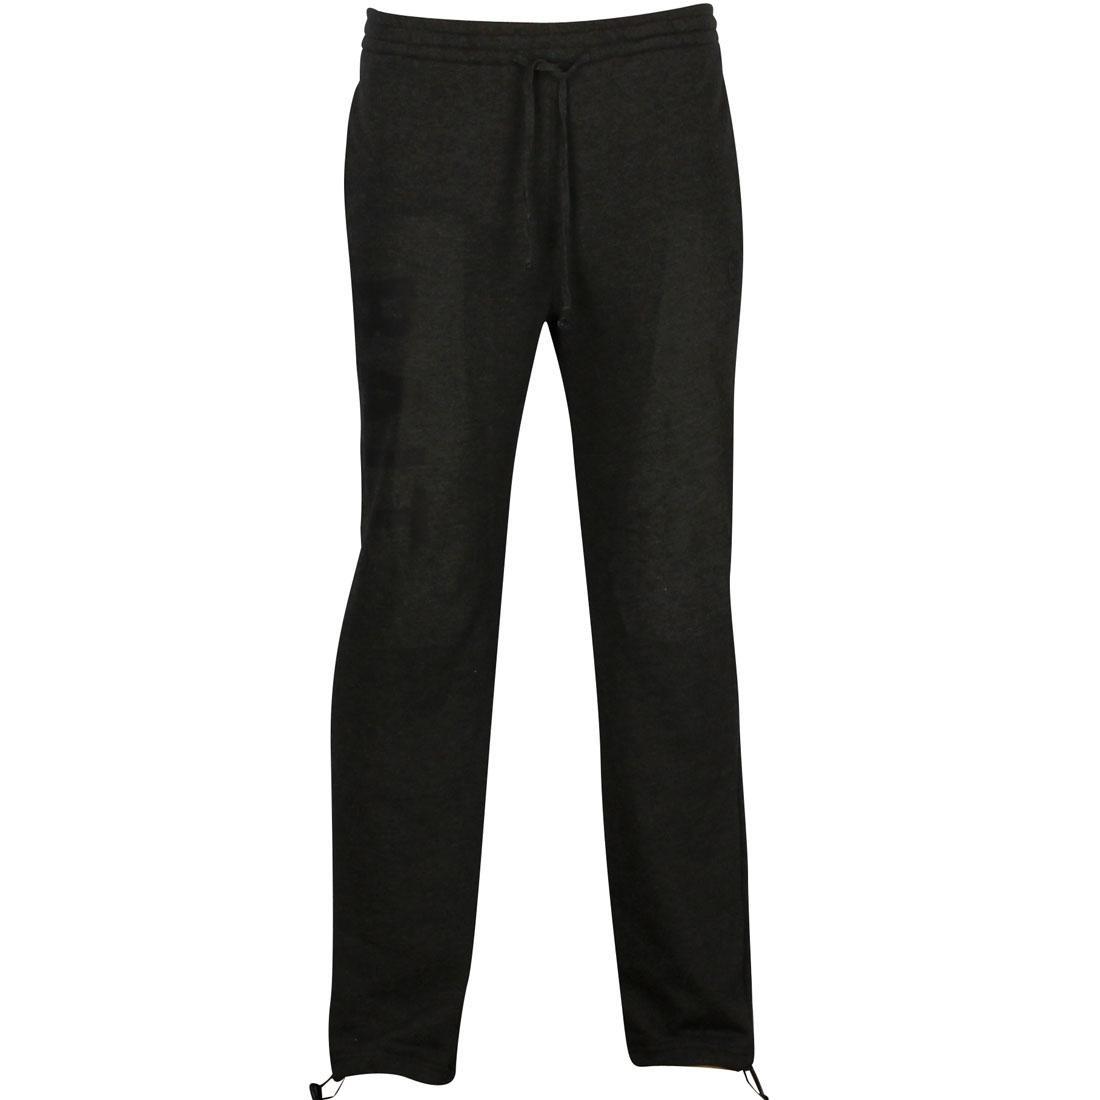 BAIT CruelWorld Sweatpants (charcoal / black)